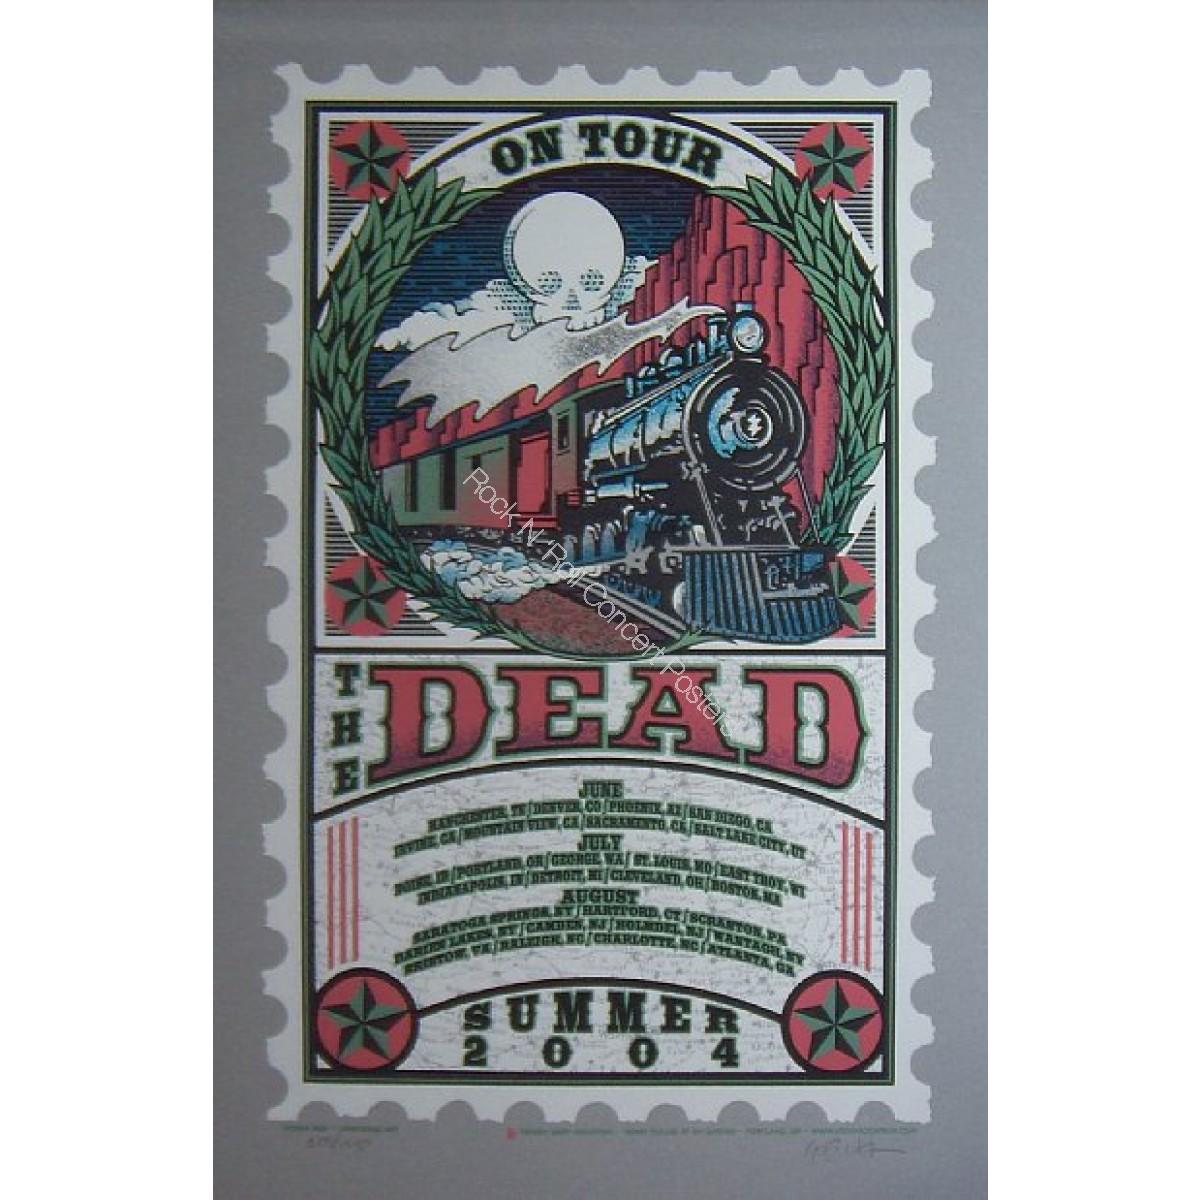 The Dead Summer Tour 2004